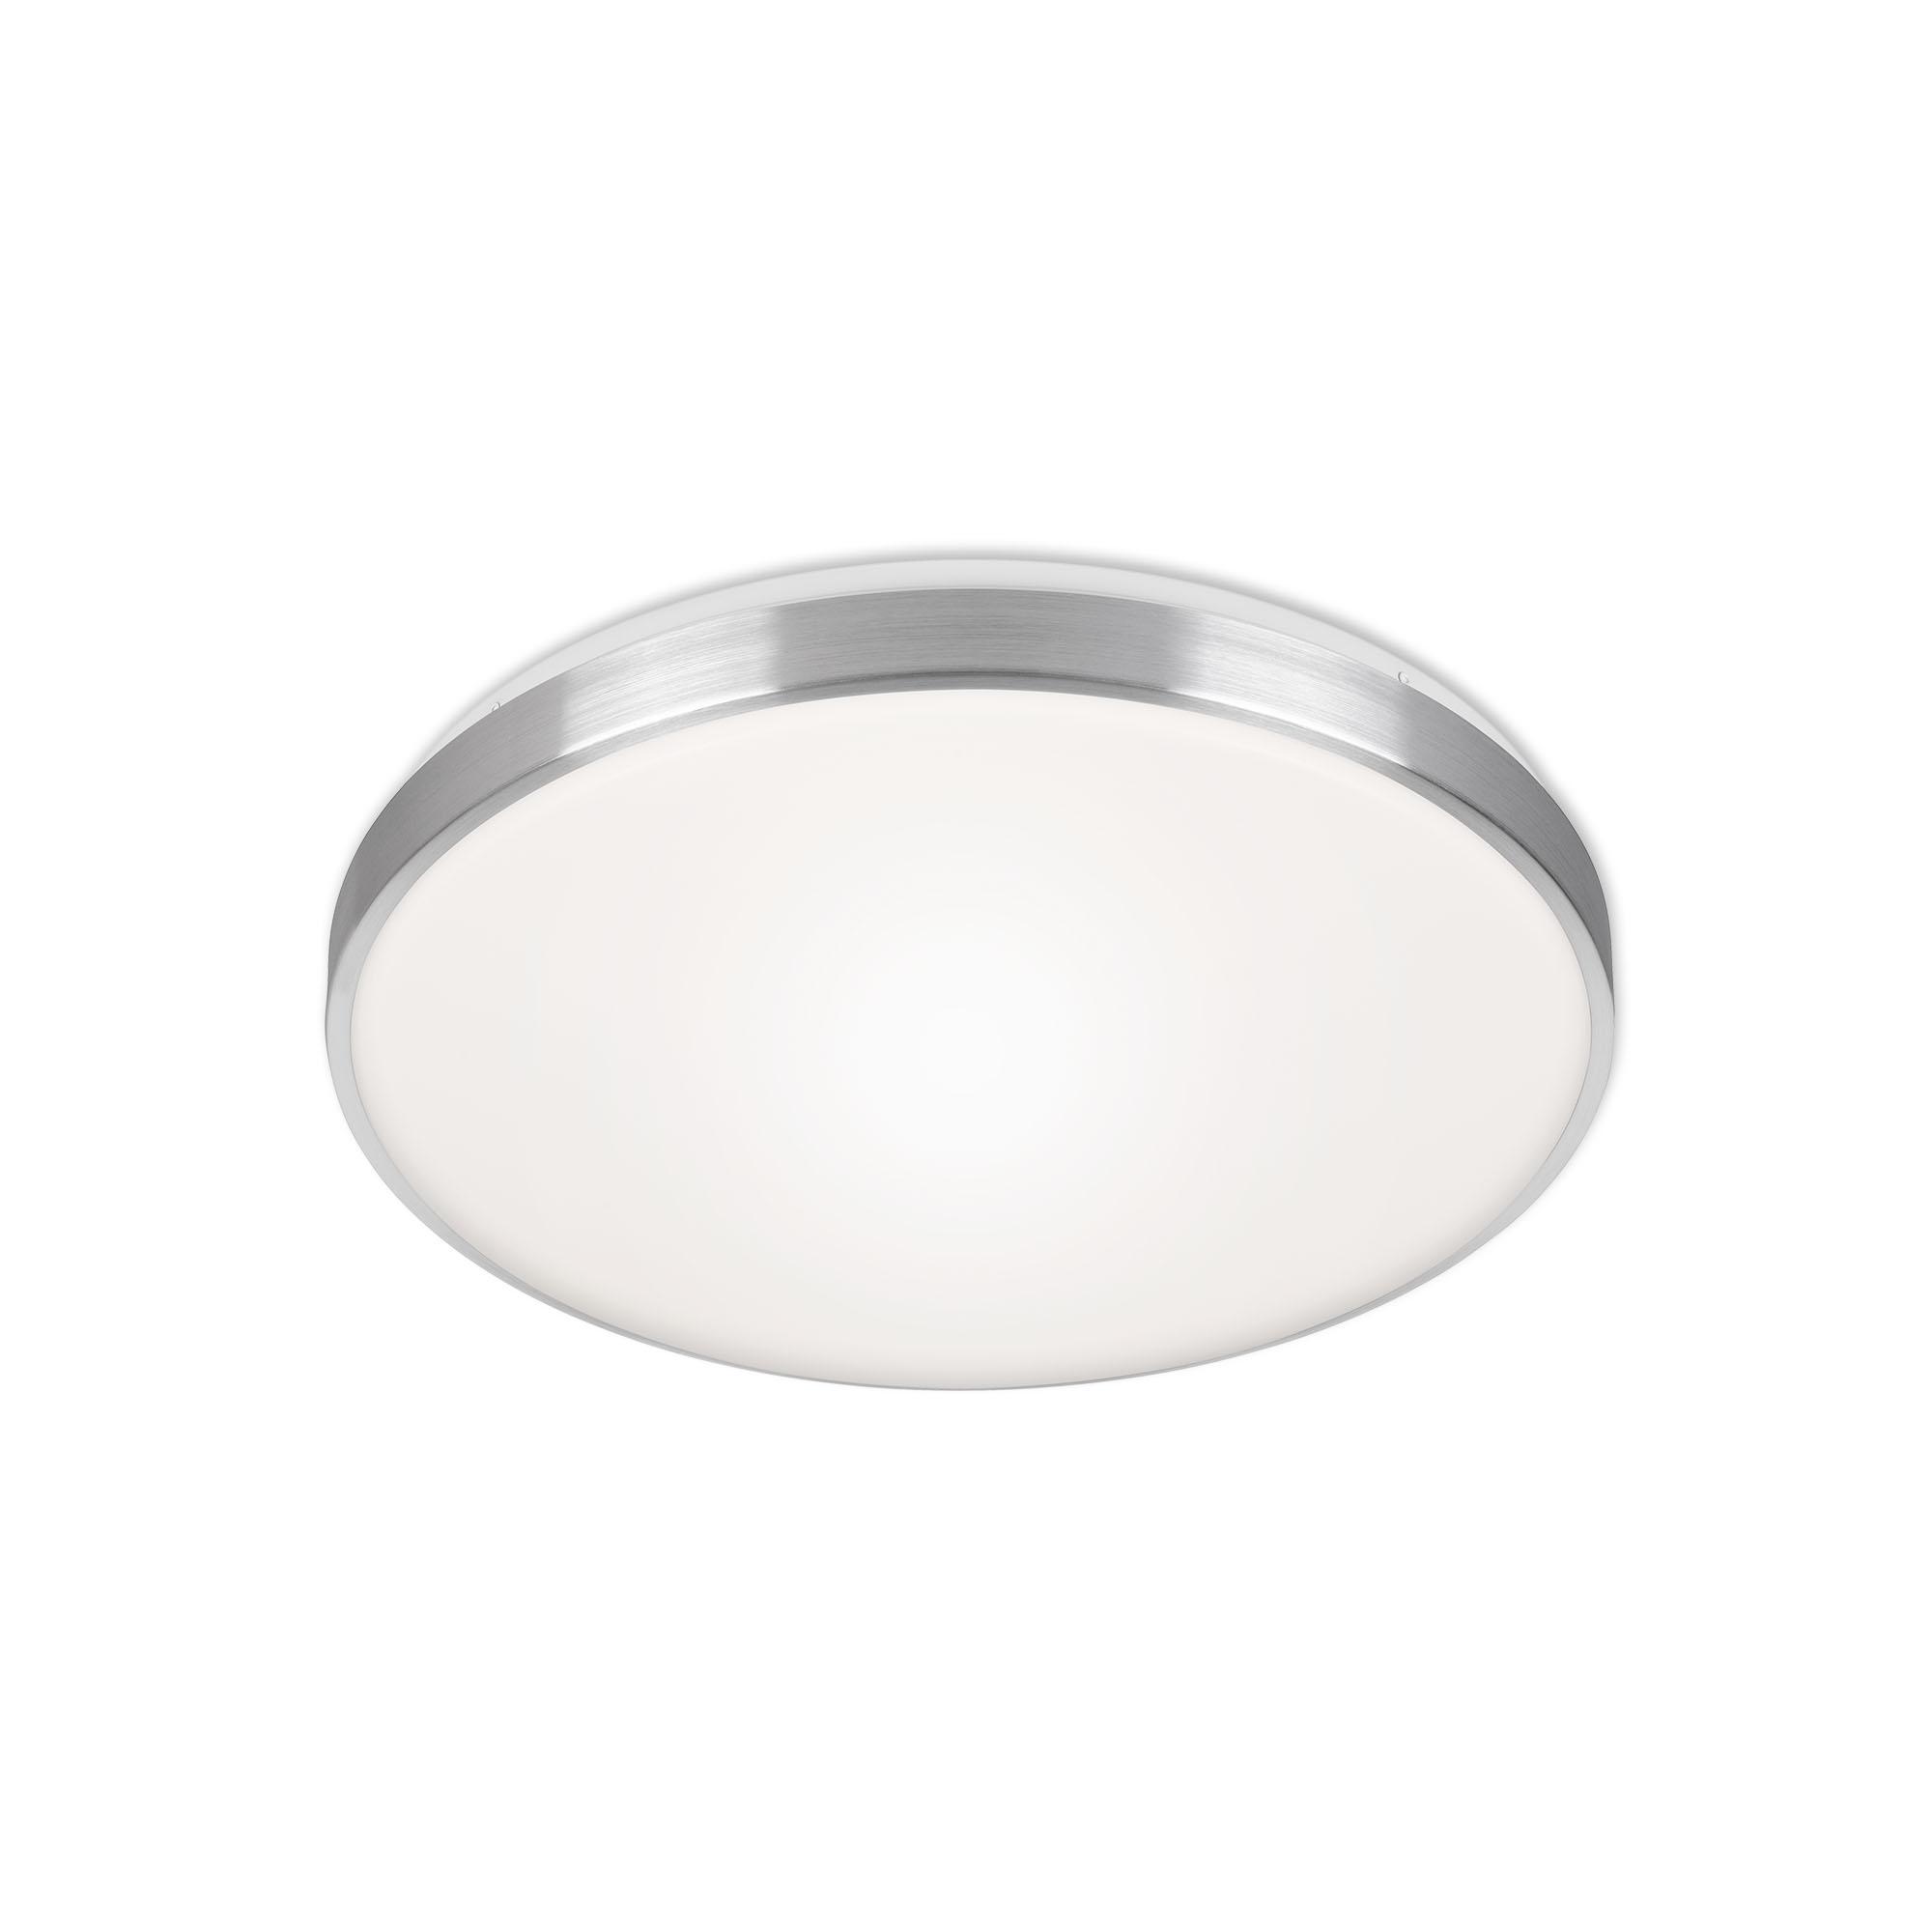 CCT LED Deckenleuchte, Ø 47 cm, 48 W, Alu